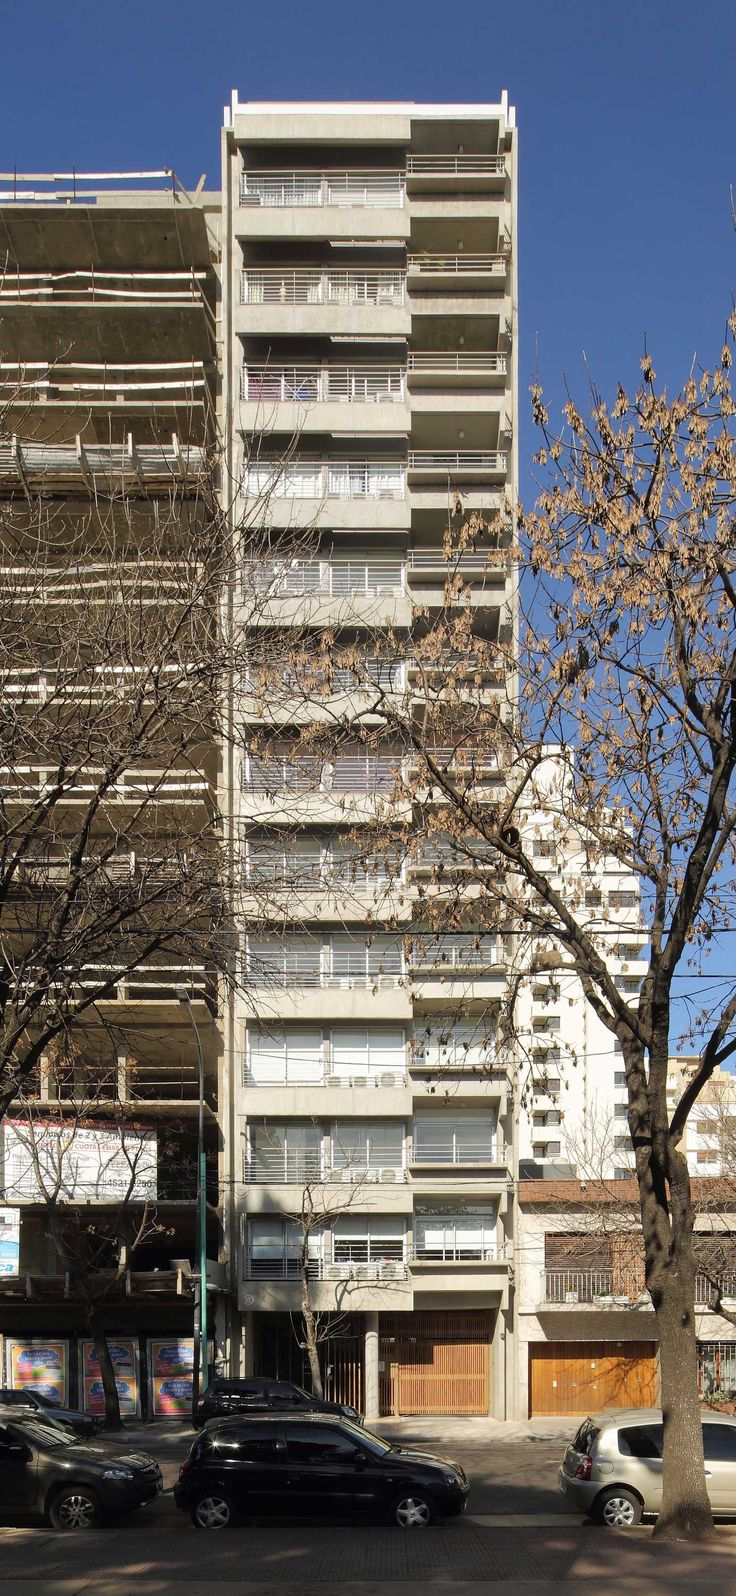 MONROE | Proyecto C. Autores: Arq. Sebastián Cseh - Arq. Juan Cruz Catania. #arquitectura #architecture #building @sebacseh @juancruzcatania